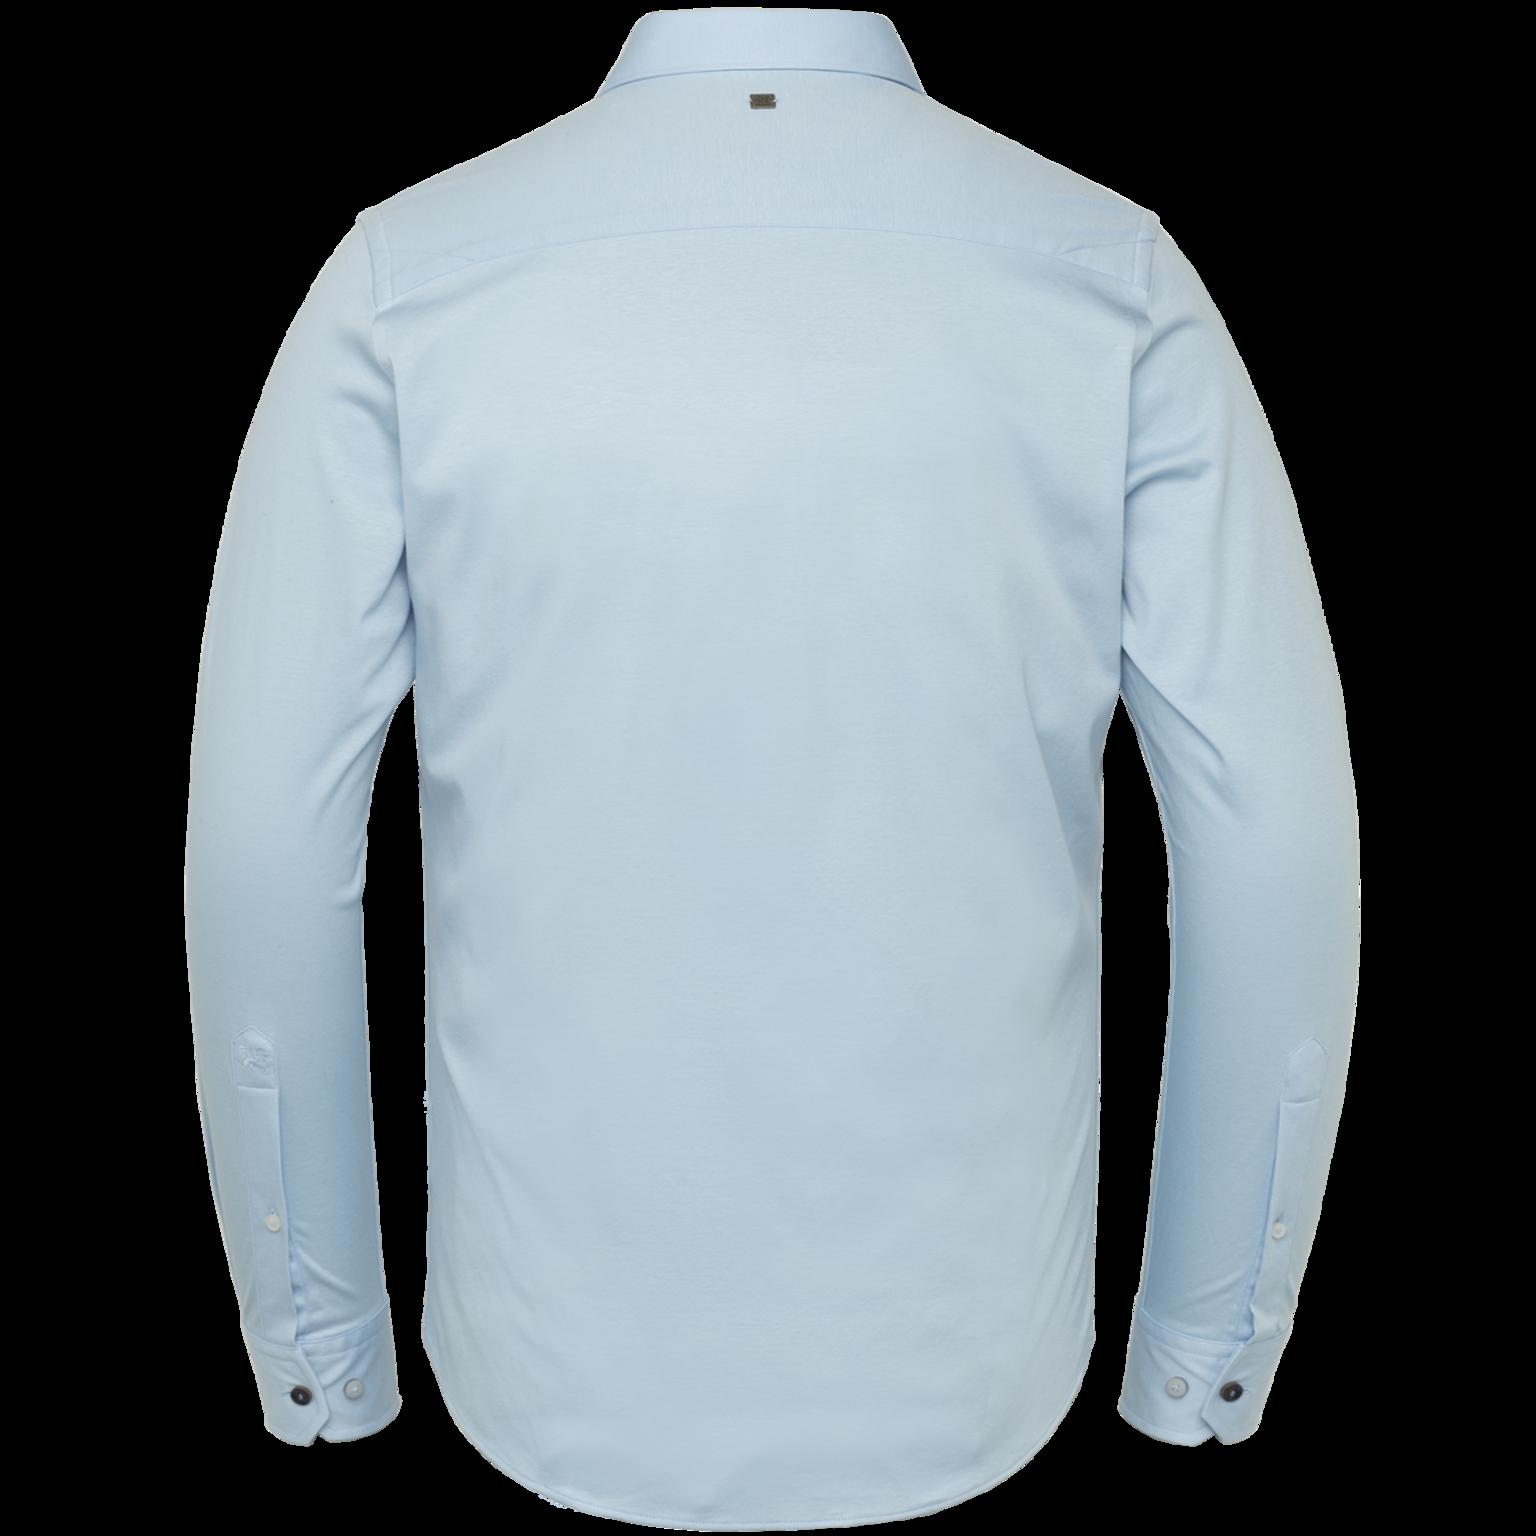 VANGUARD chemise longues manches jersey-4